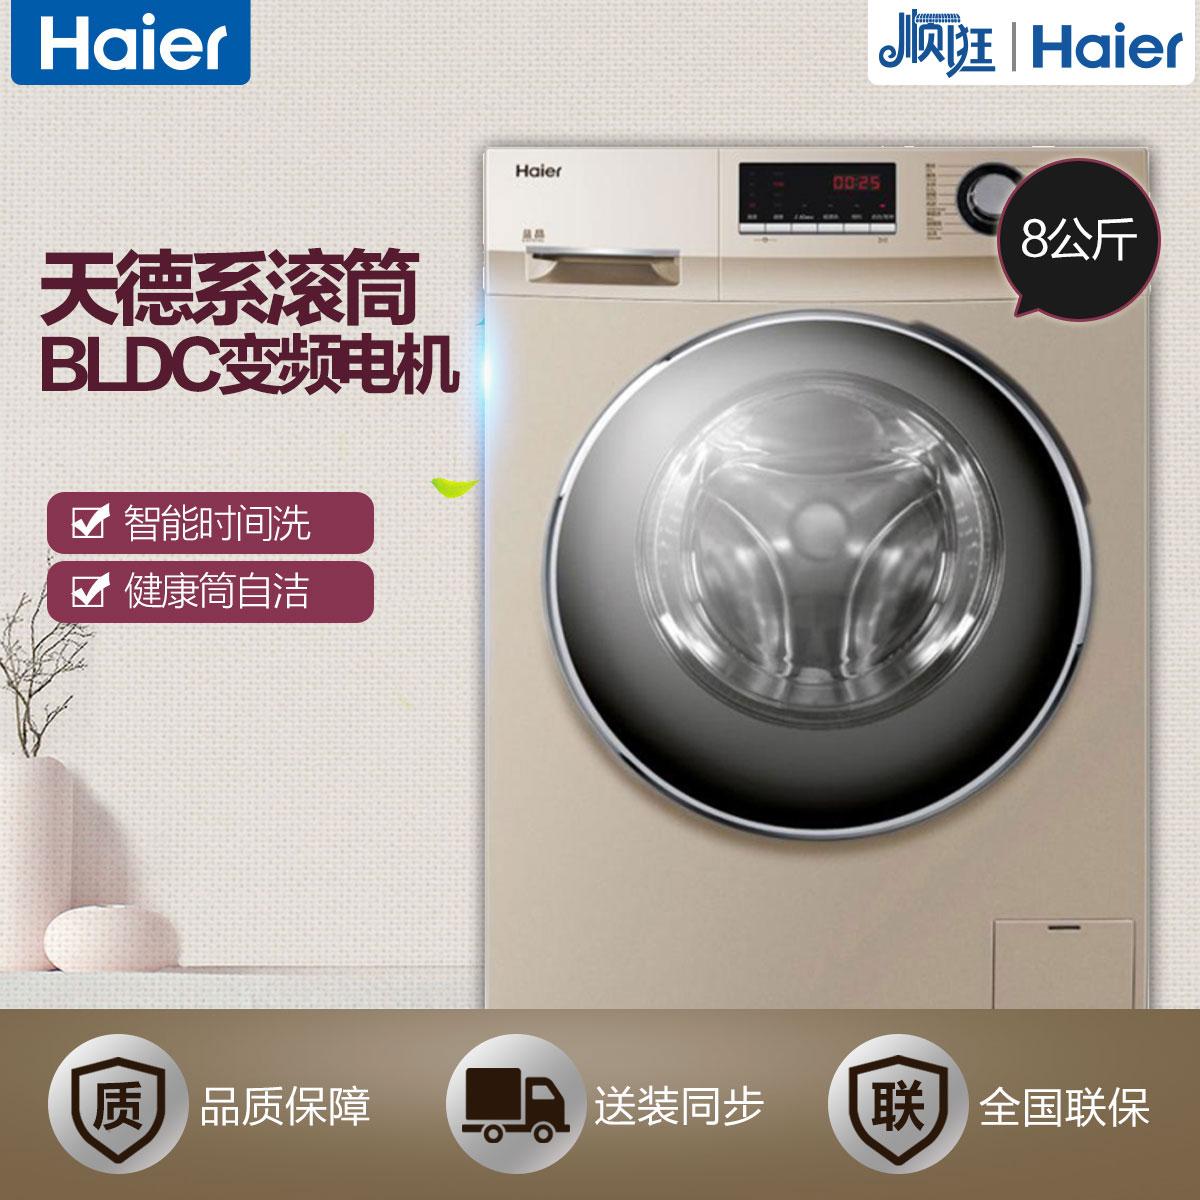 Haier/海尔             滚筒洗衣机             G80629BKX12G